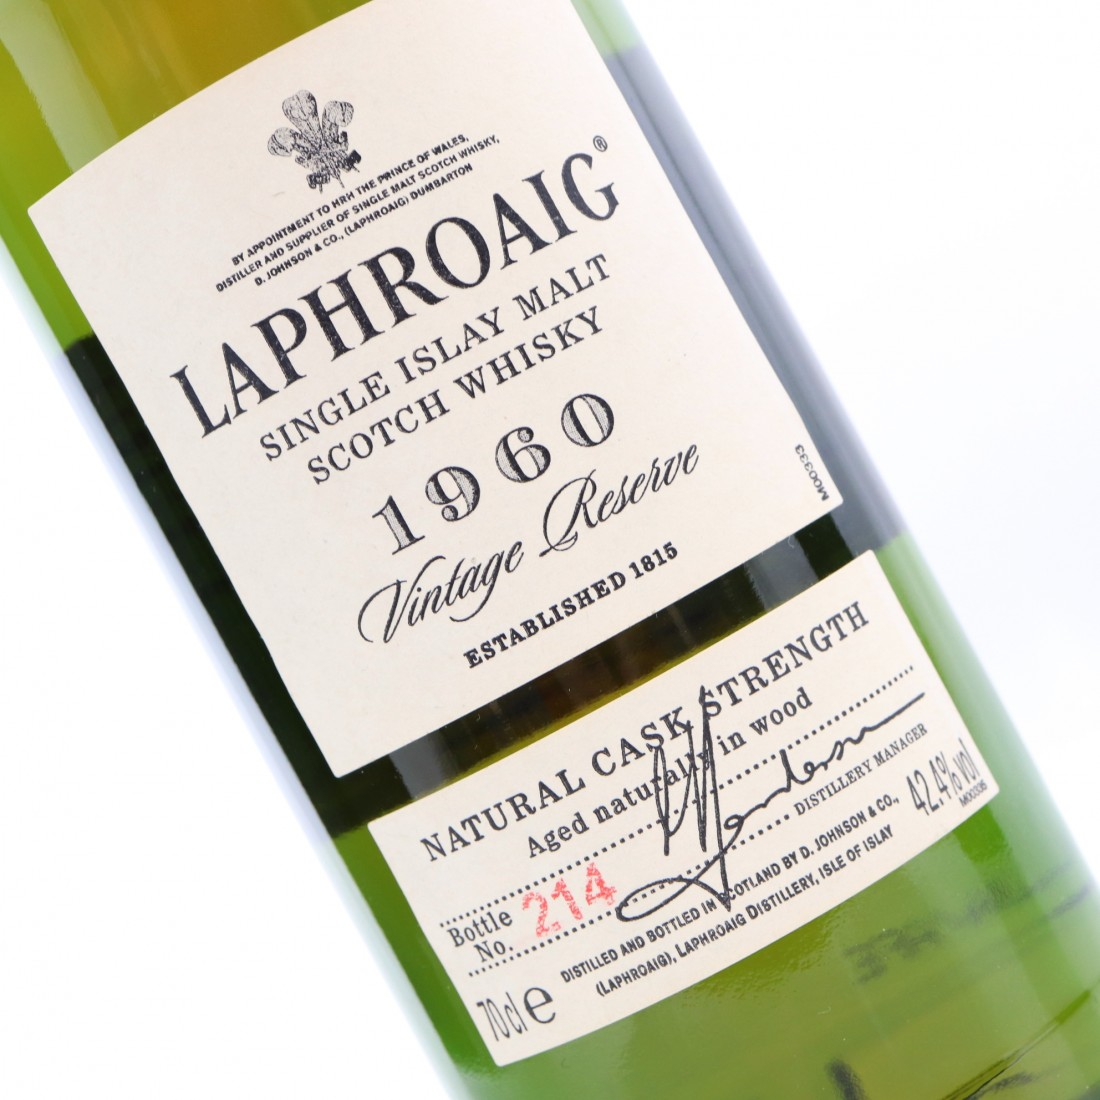 Laphroaig 1960 Vintage Reserve 40 Year Old